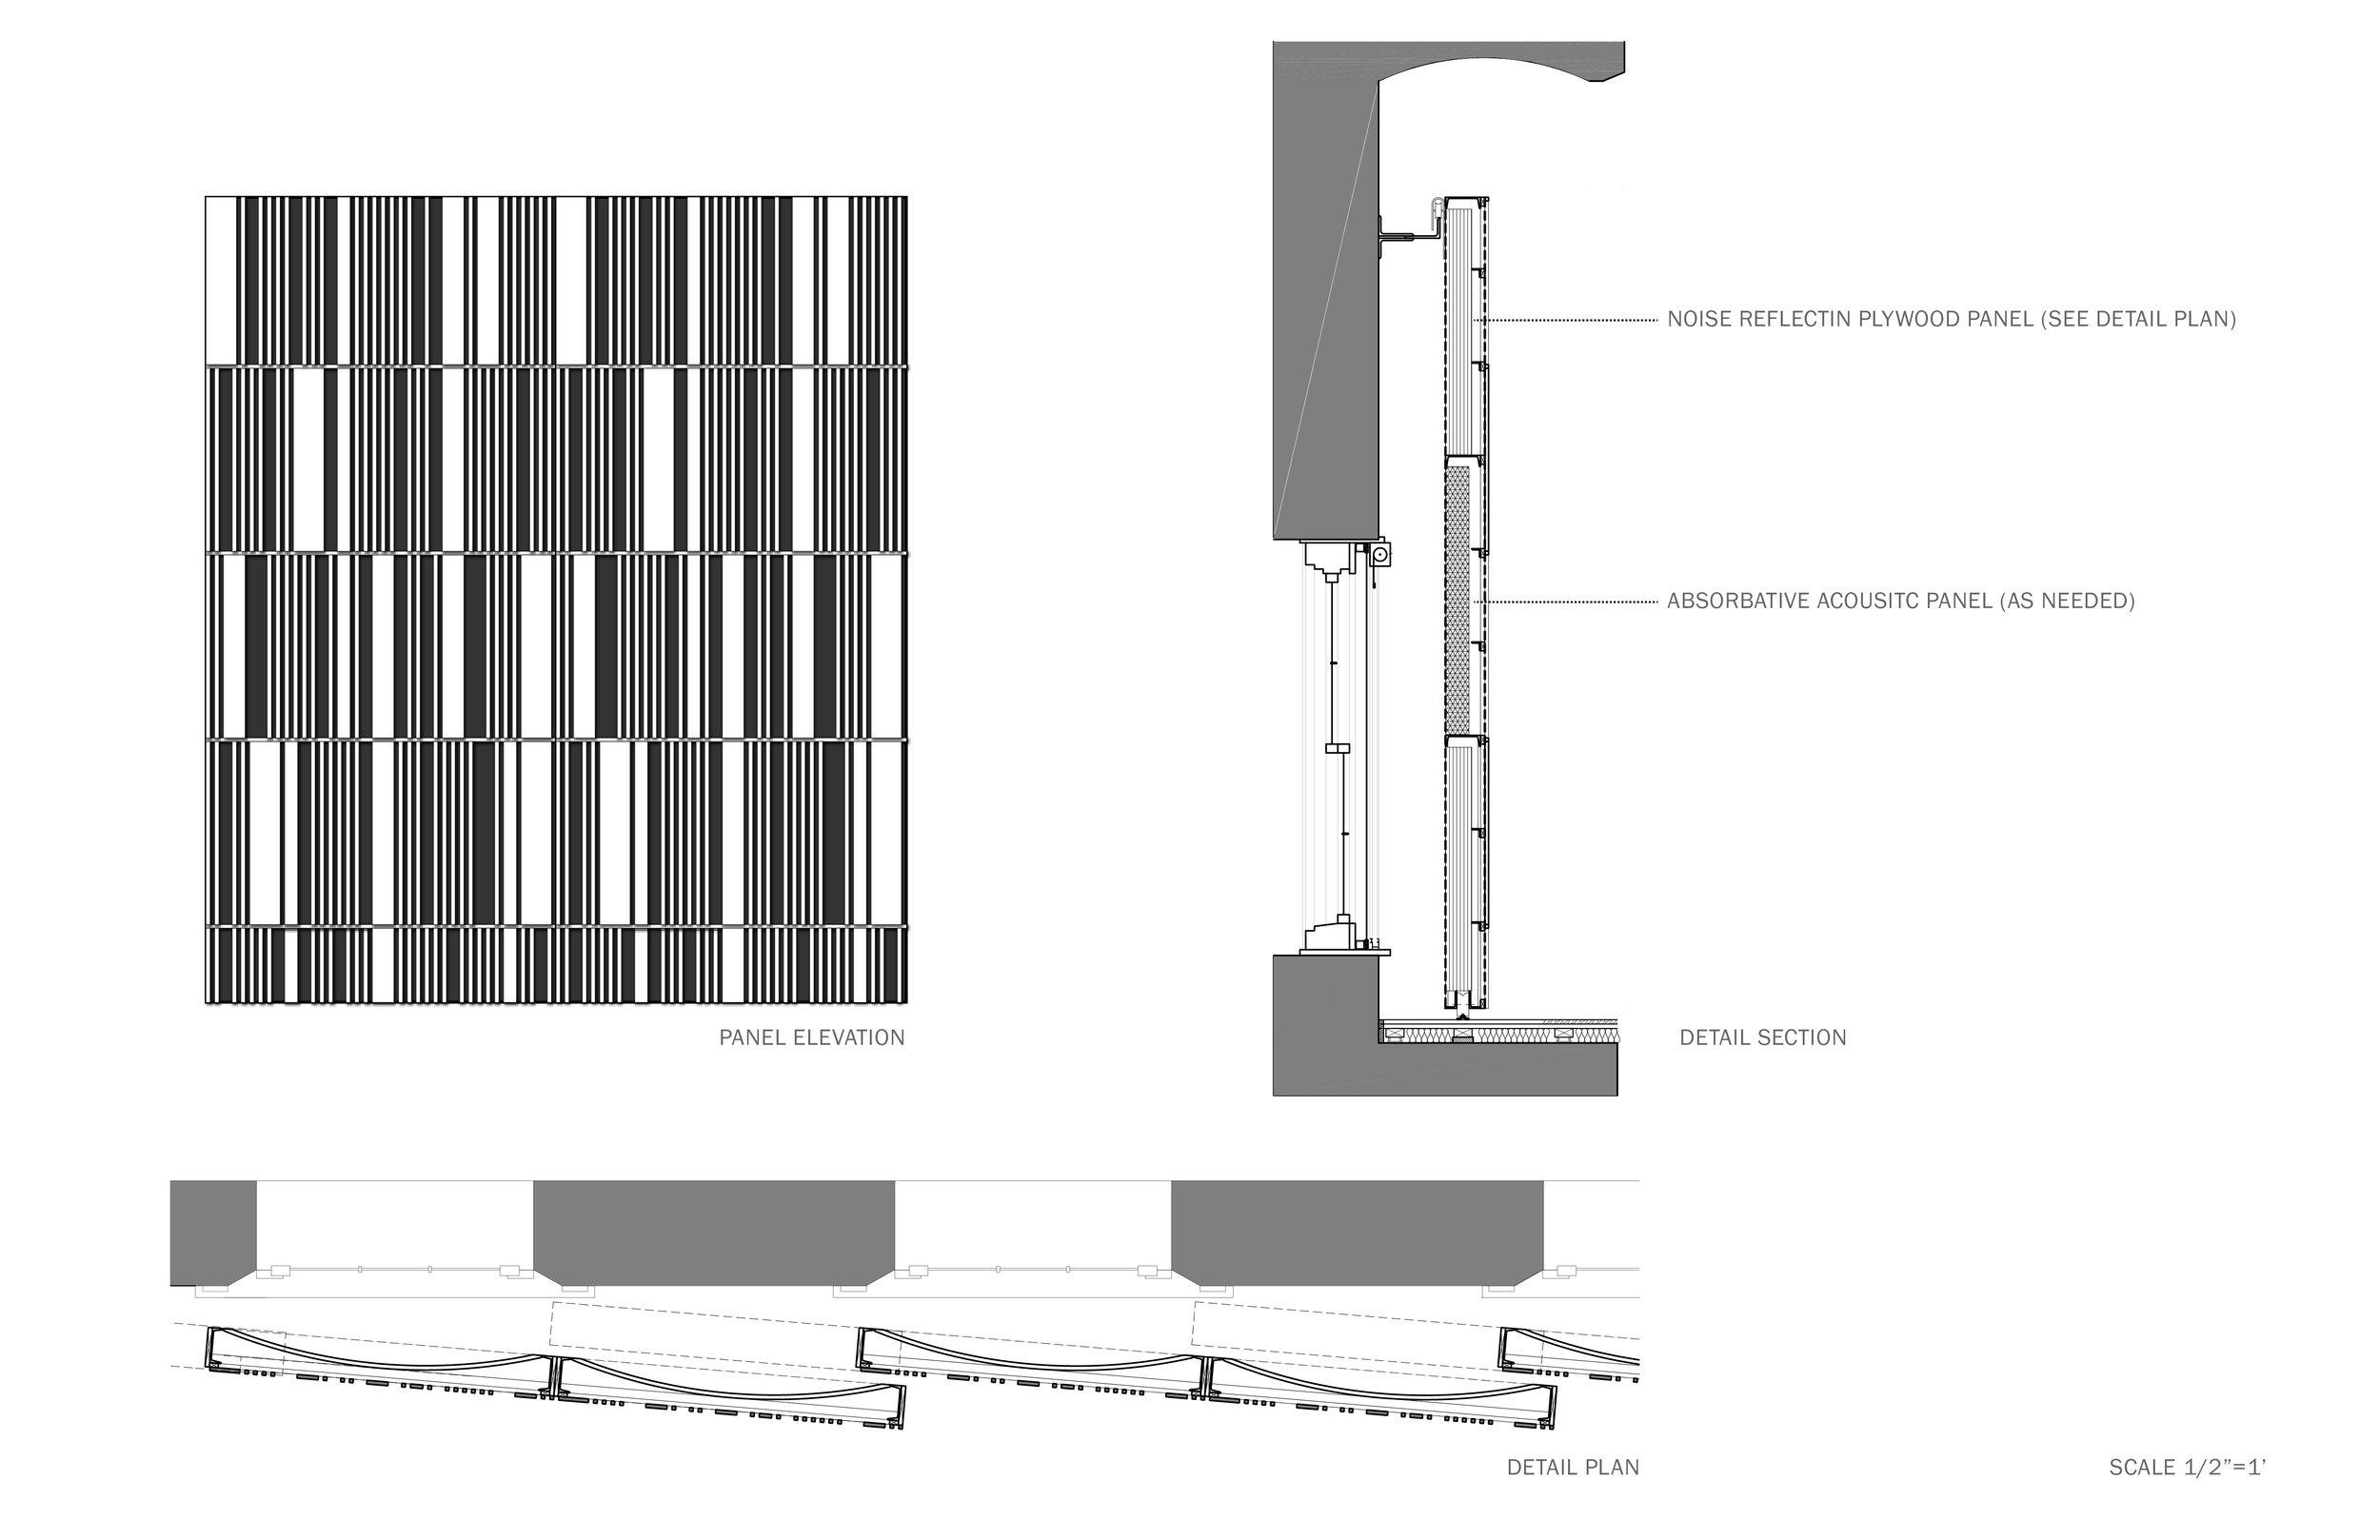 Panel Detail courtesy of Eskew+Dumez+Ripple